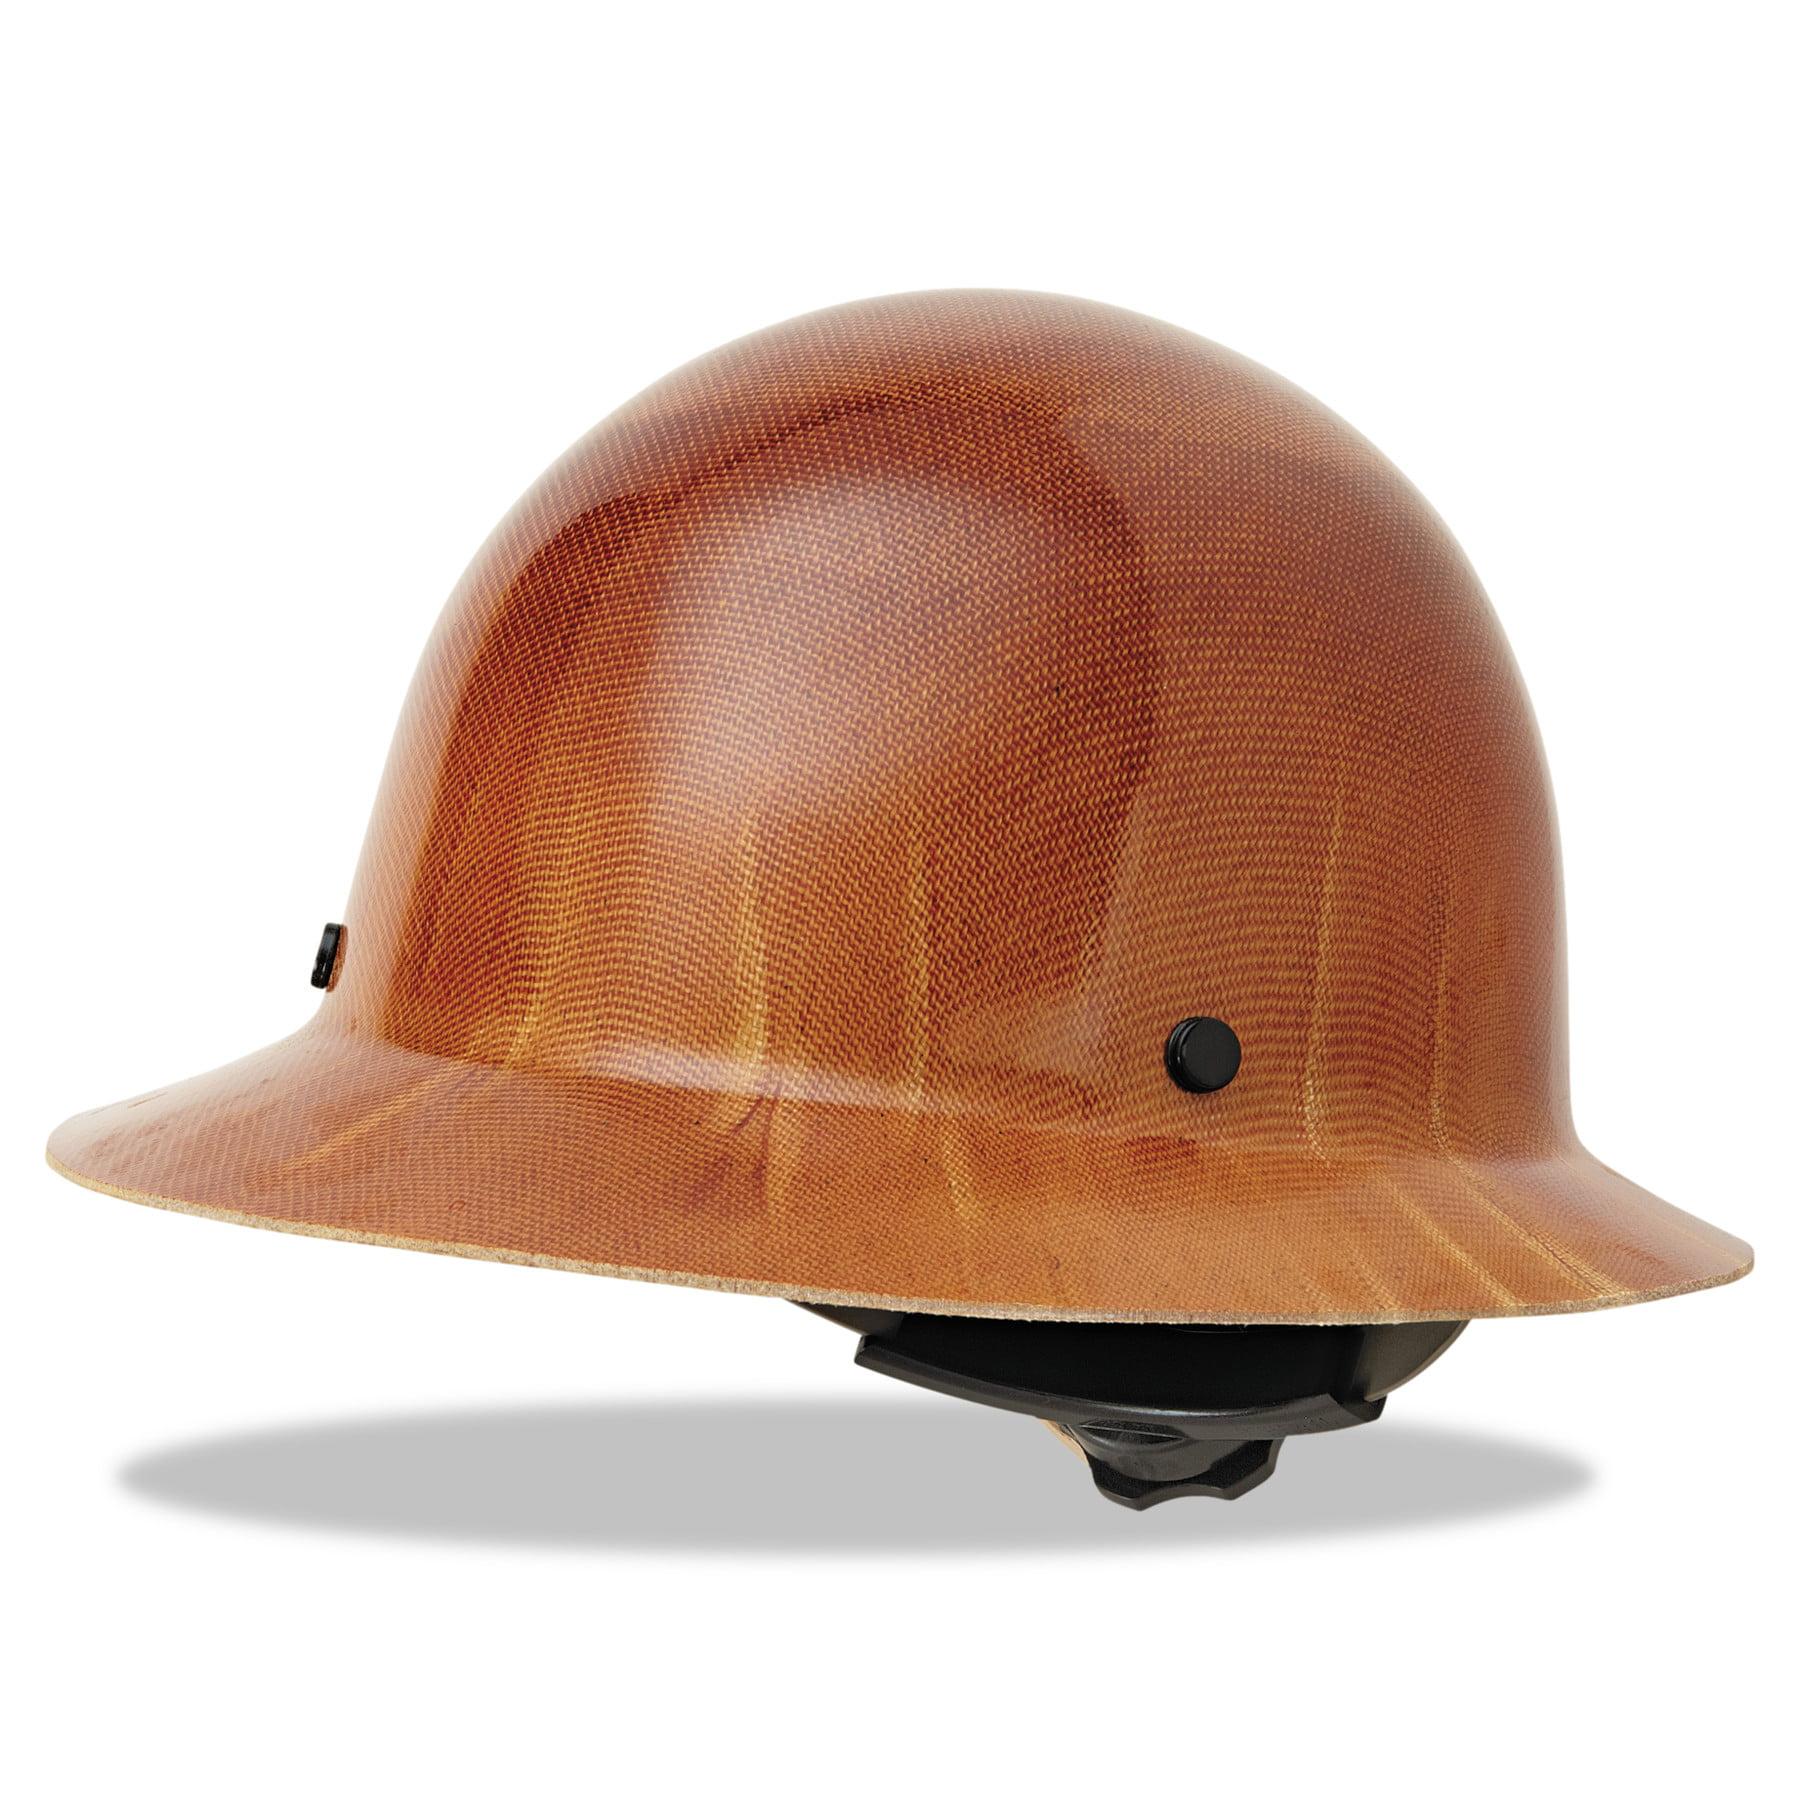 e9e507d0815 MSA Skullgard Protective Caps and Hats